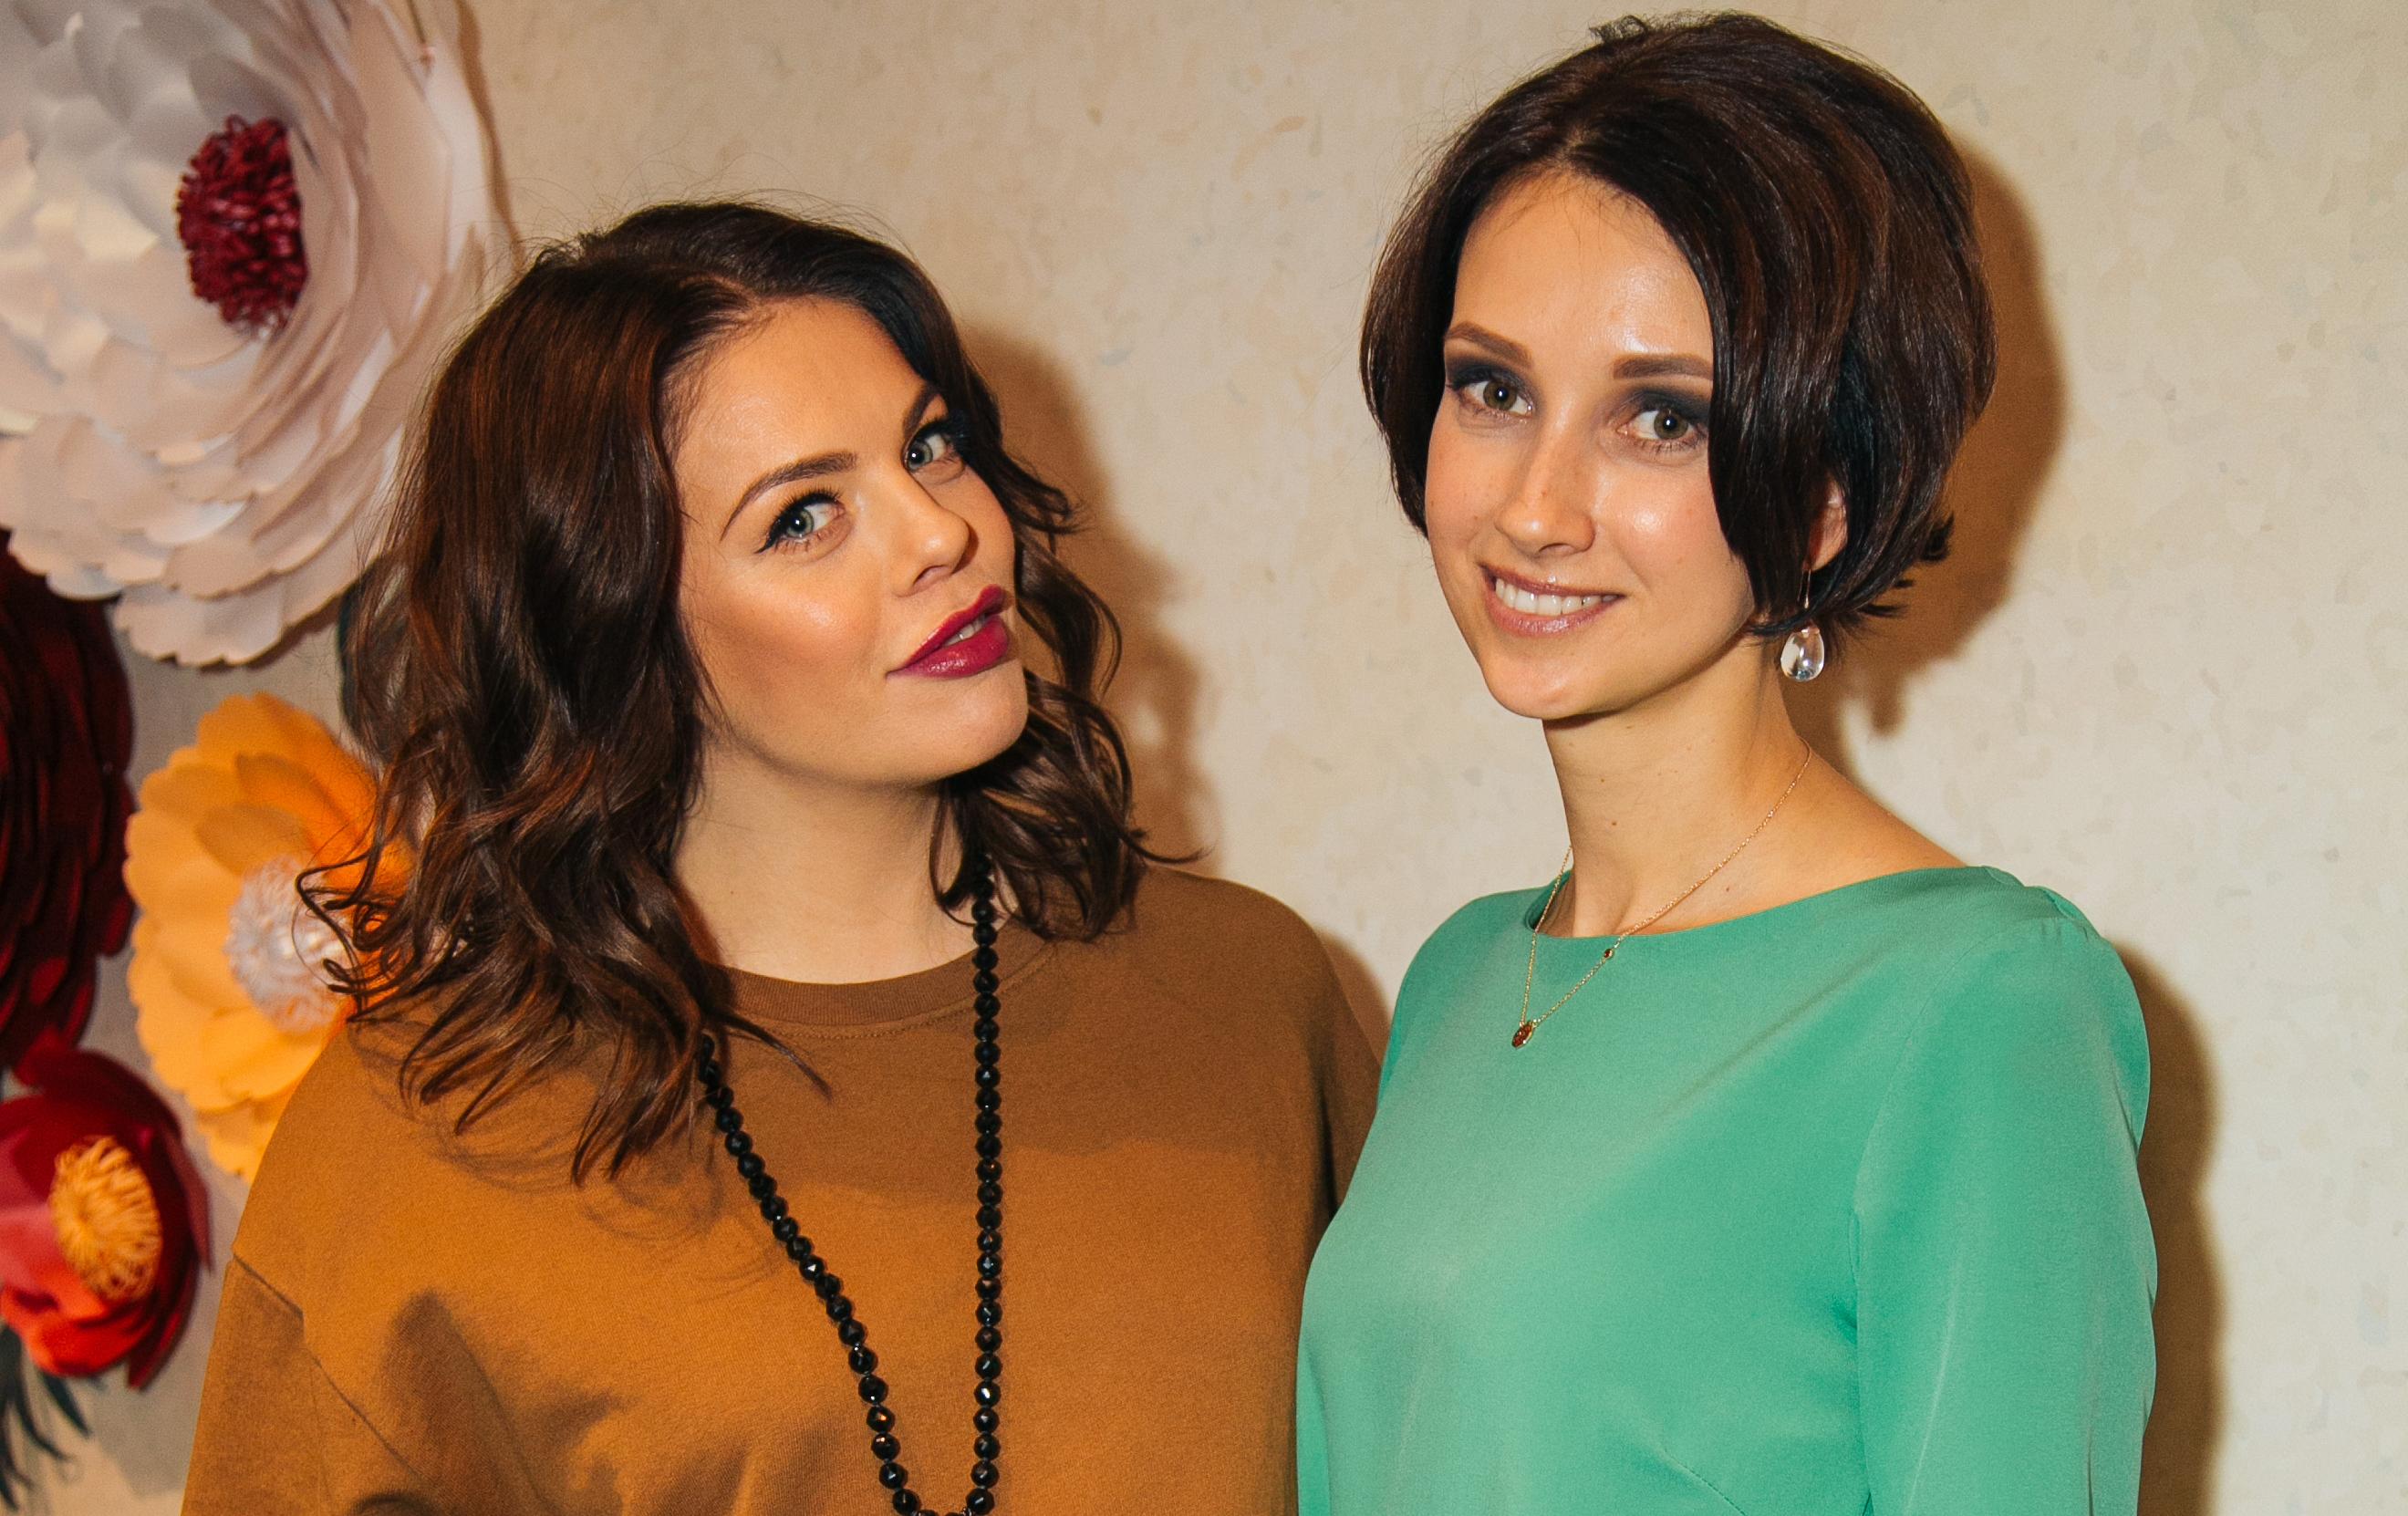 Анастасия Стоцкая и Анастасия Цветаева